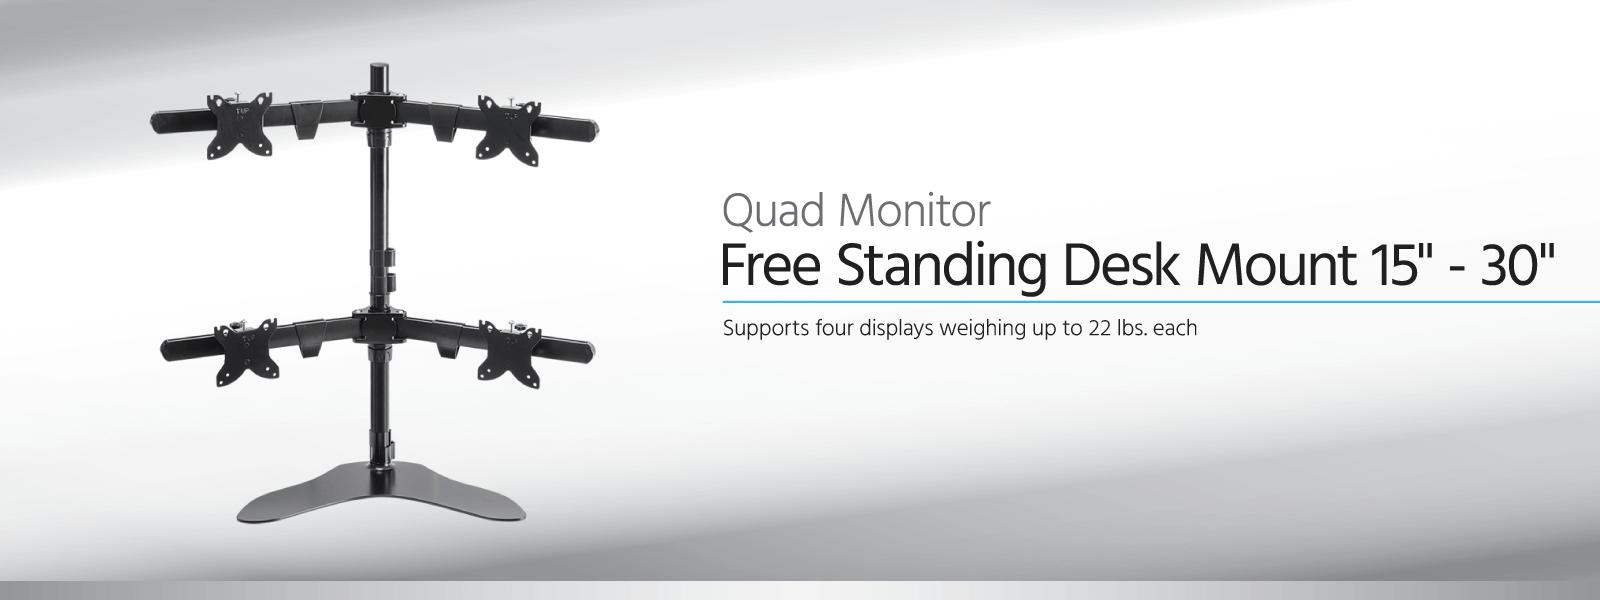 Quad Monitor Free Standing Desk Mount